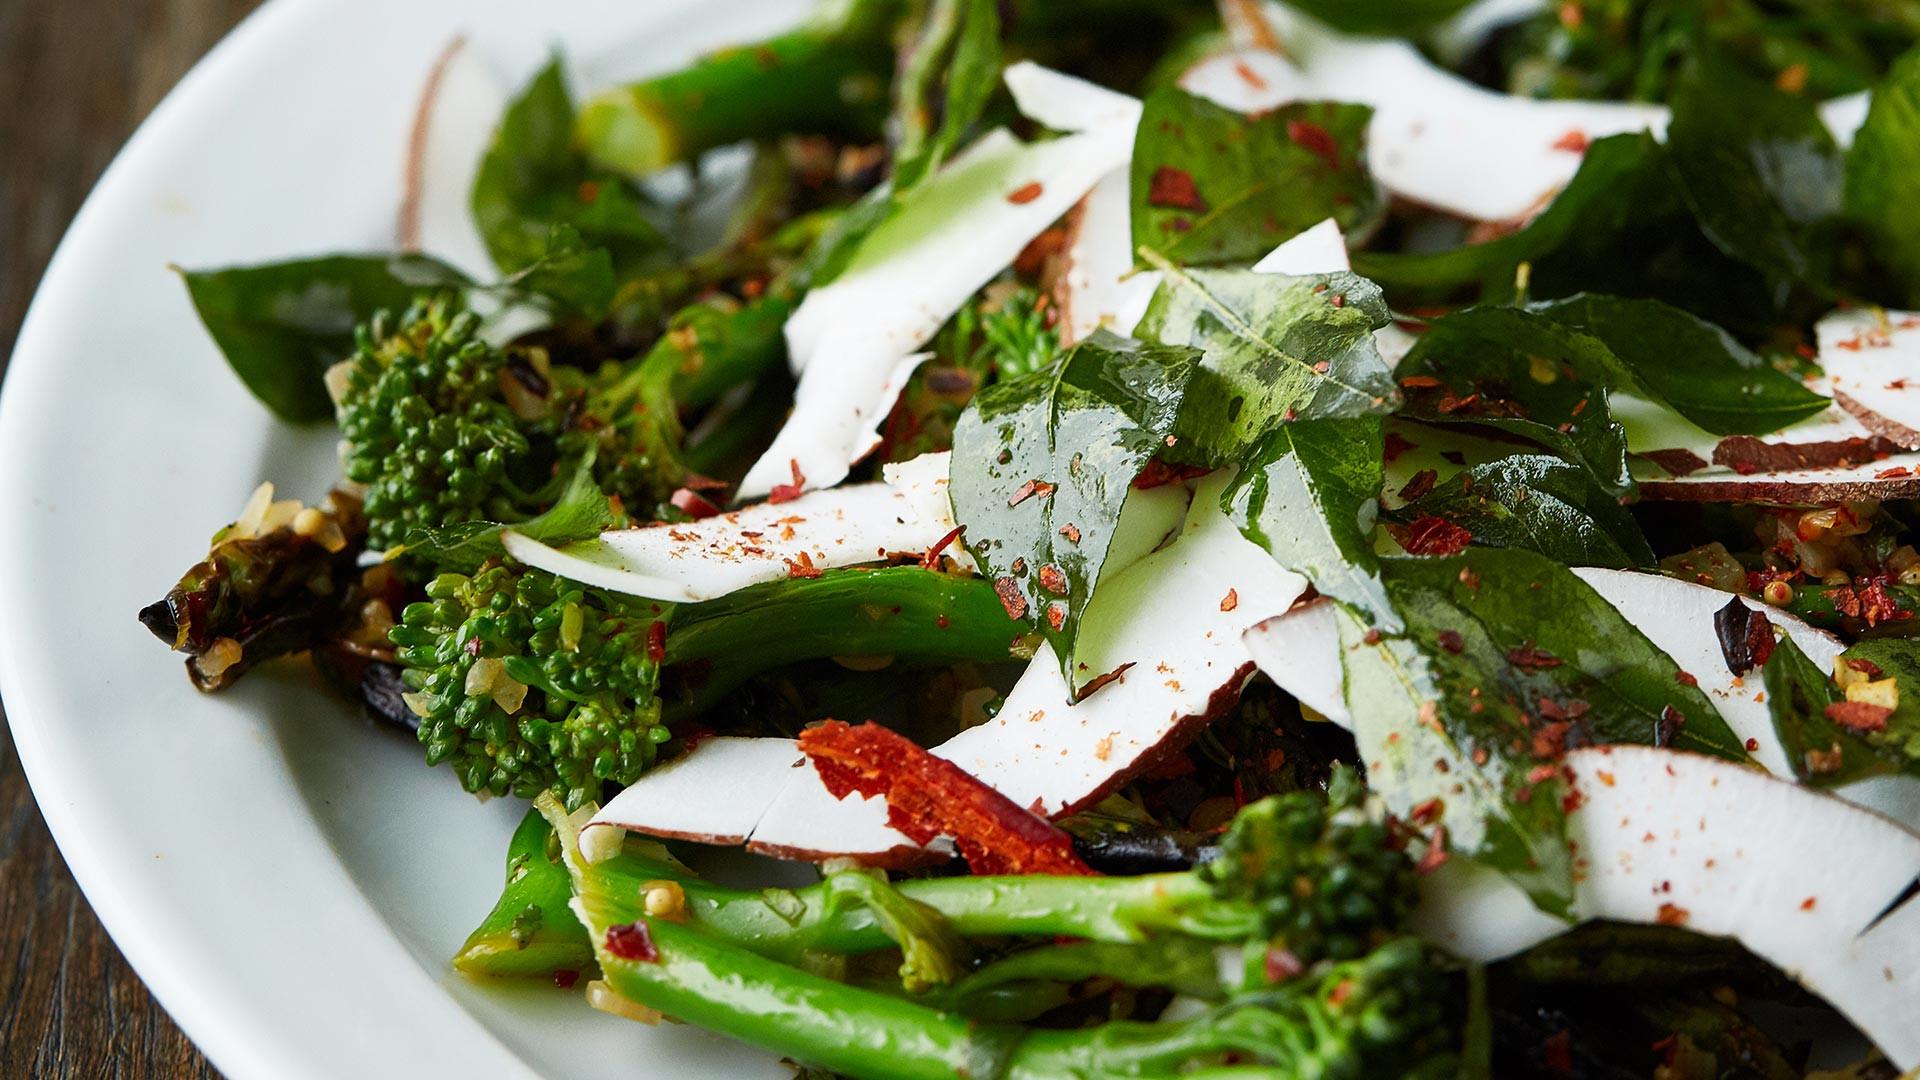 Seasonal vegetable dish at Sparrow restaurant Lewisham